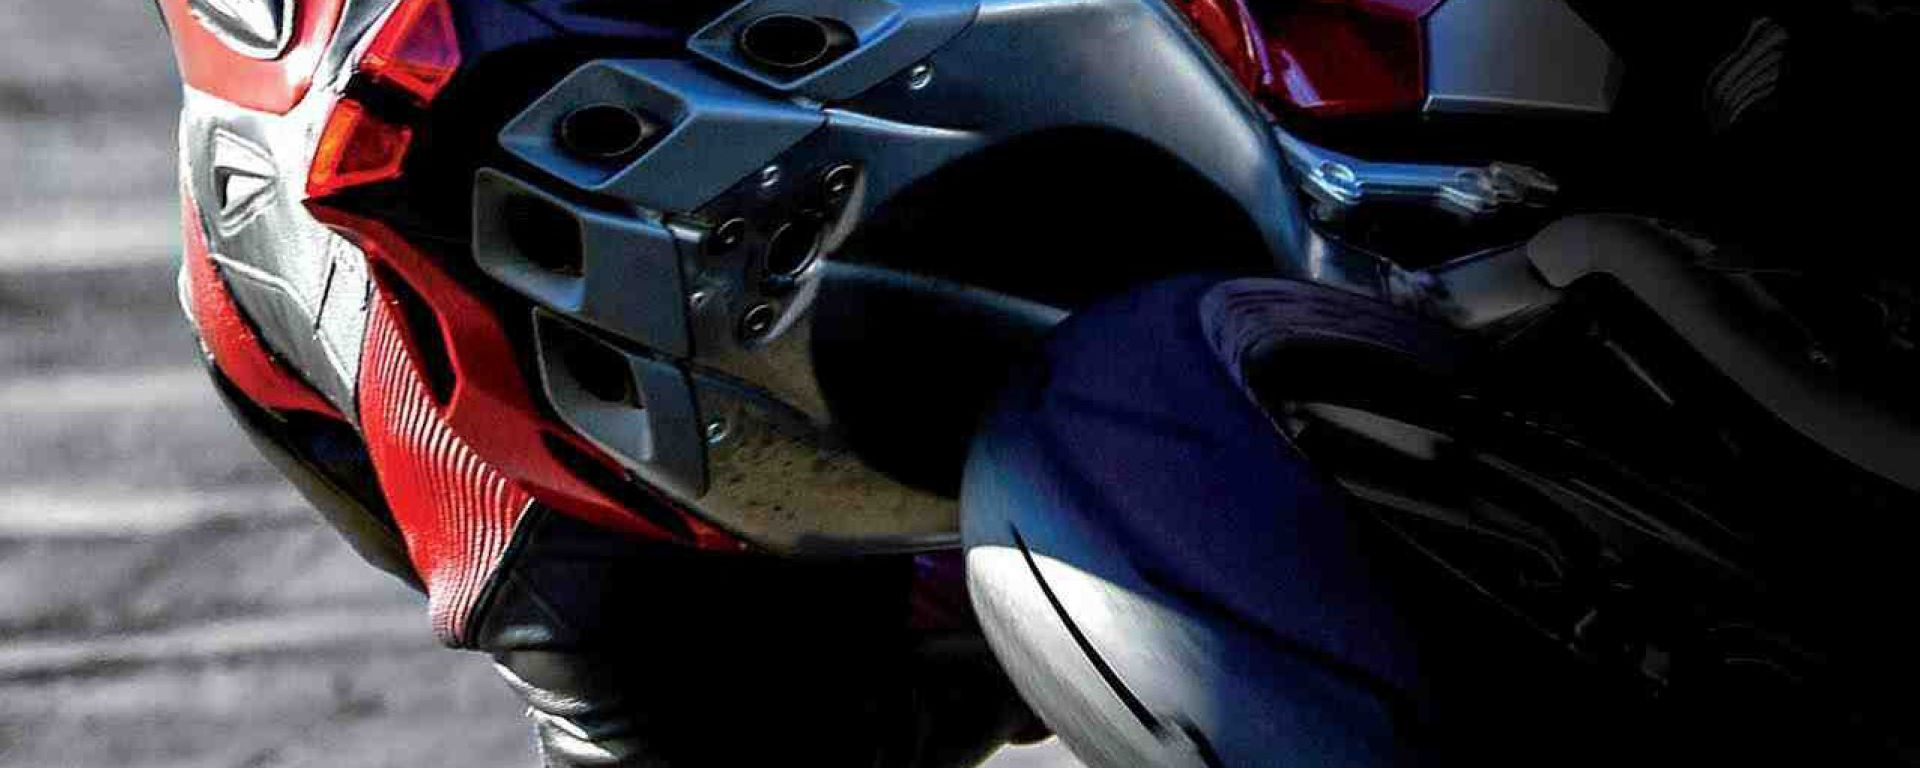 Test ride MV Agusta a Misano